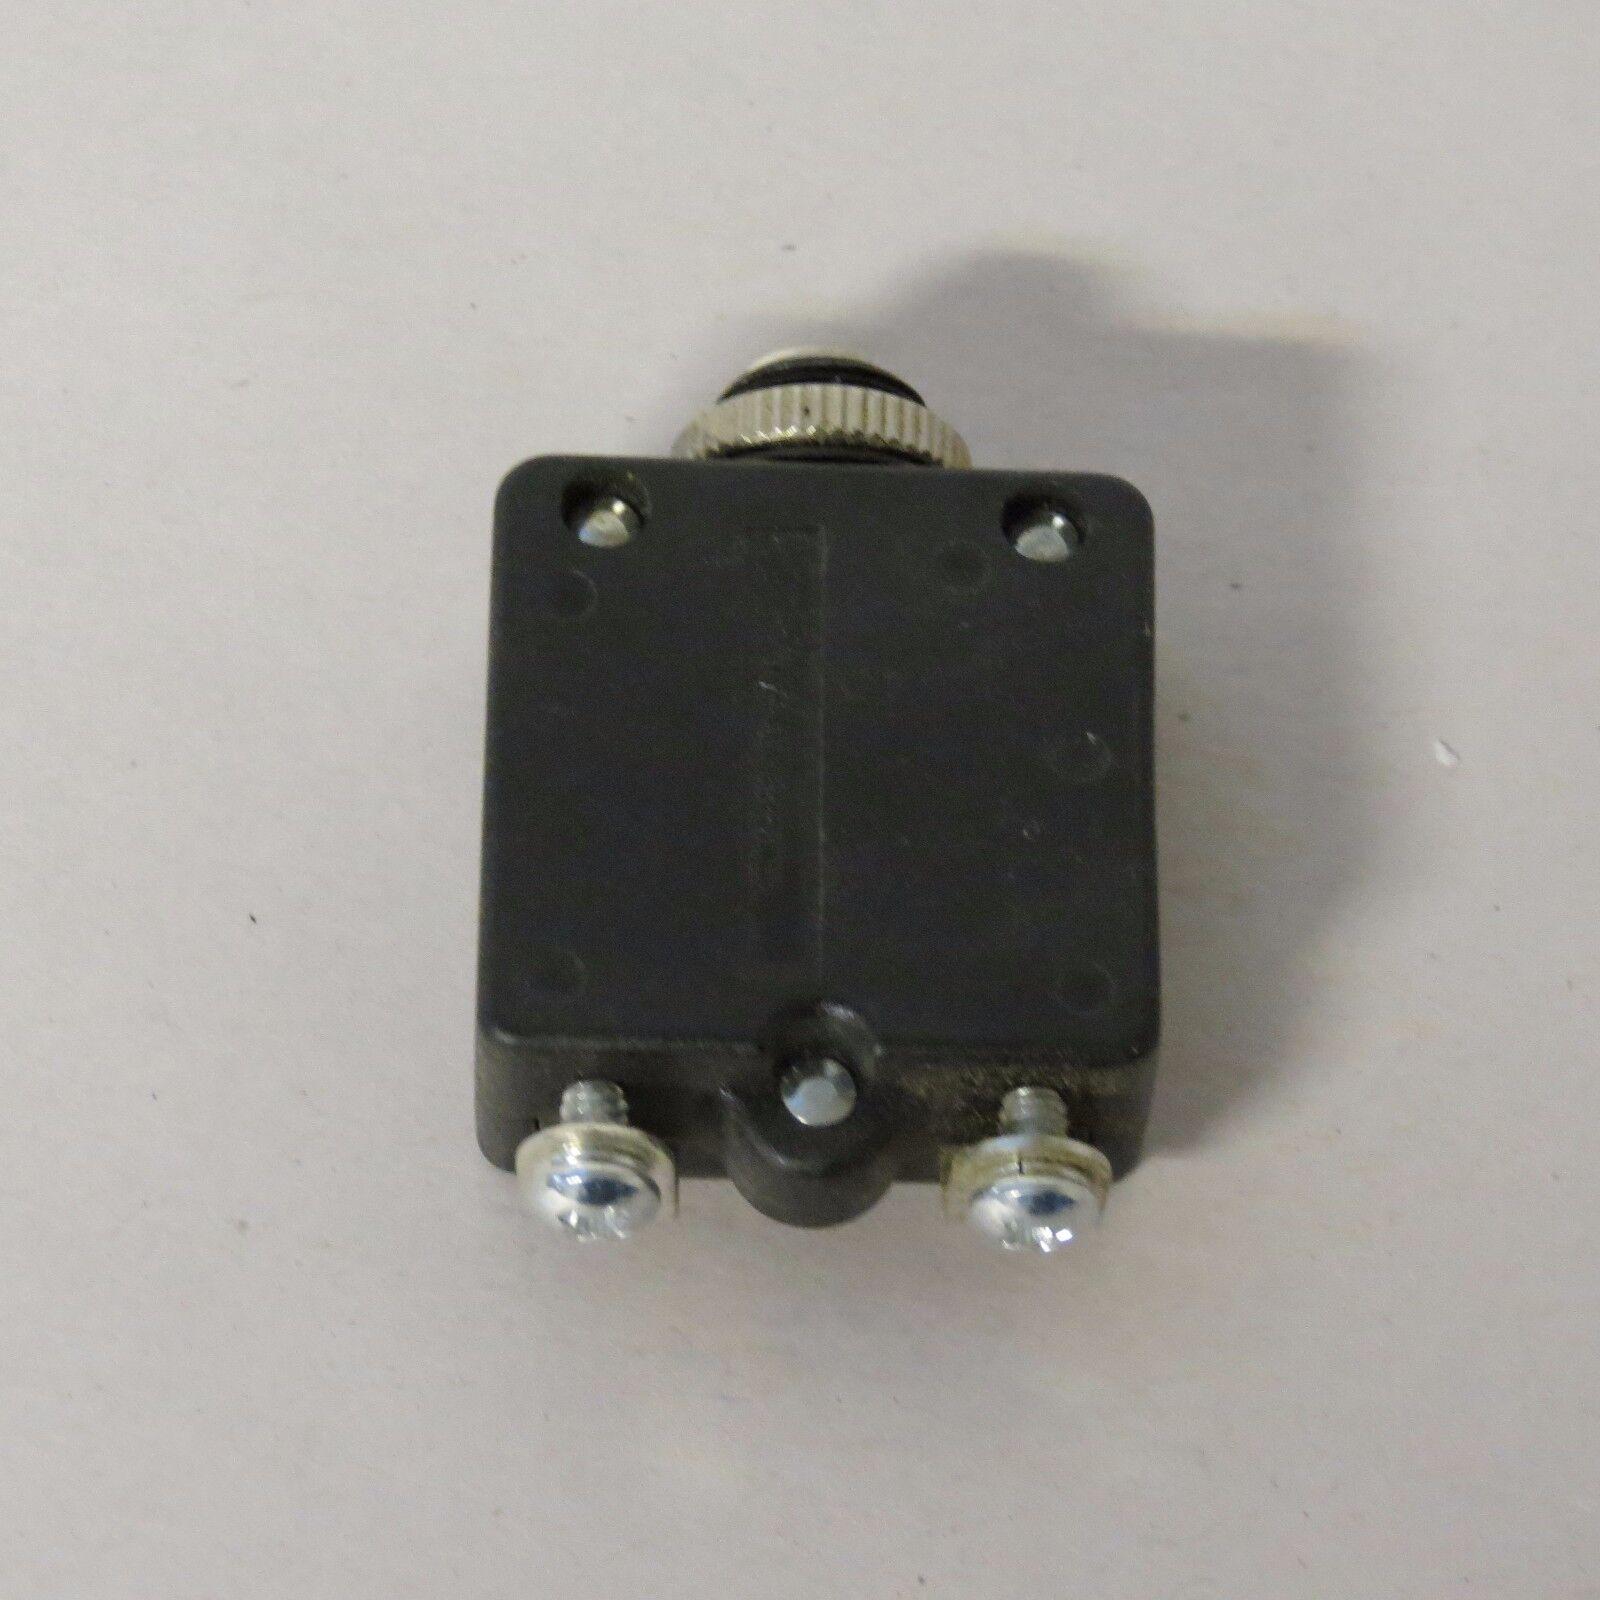 W58-XC1A4A-16 Potters /& Brumfield Tyco 1423695-4   16 amp 250VAC 50VDC Circuit B